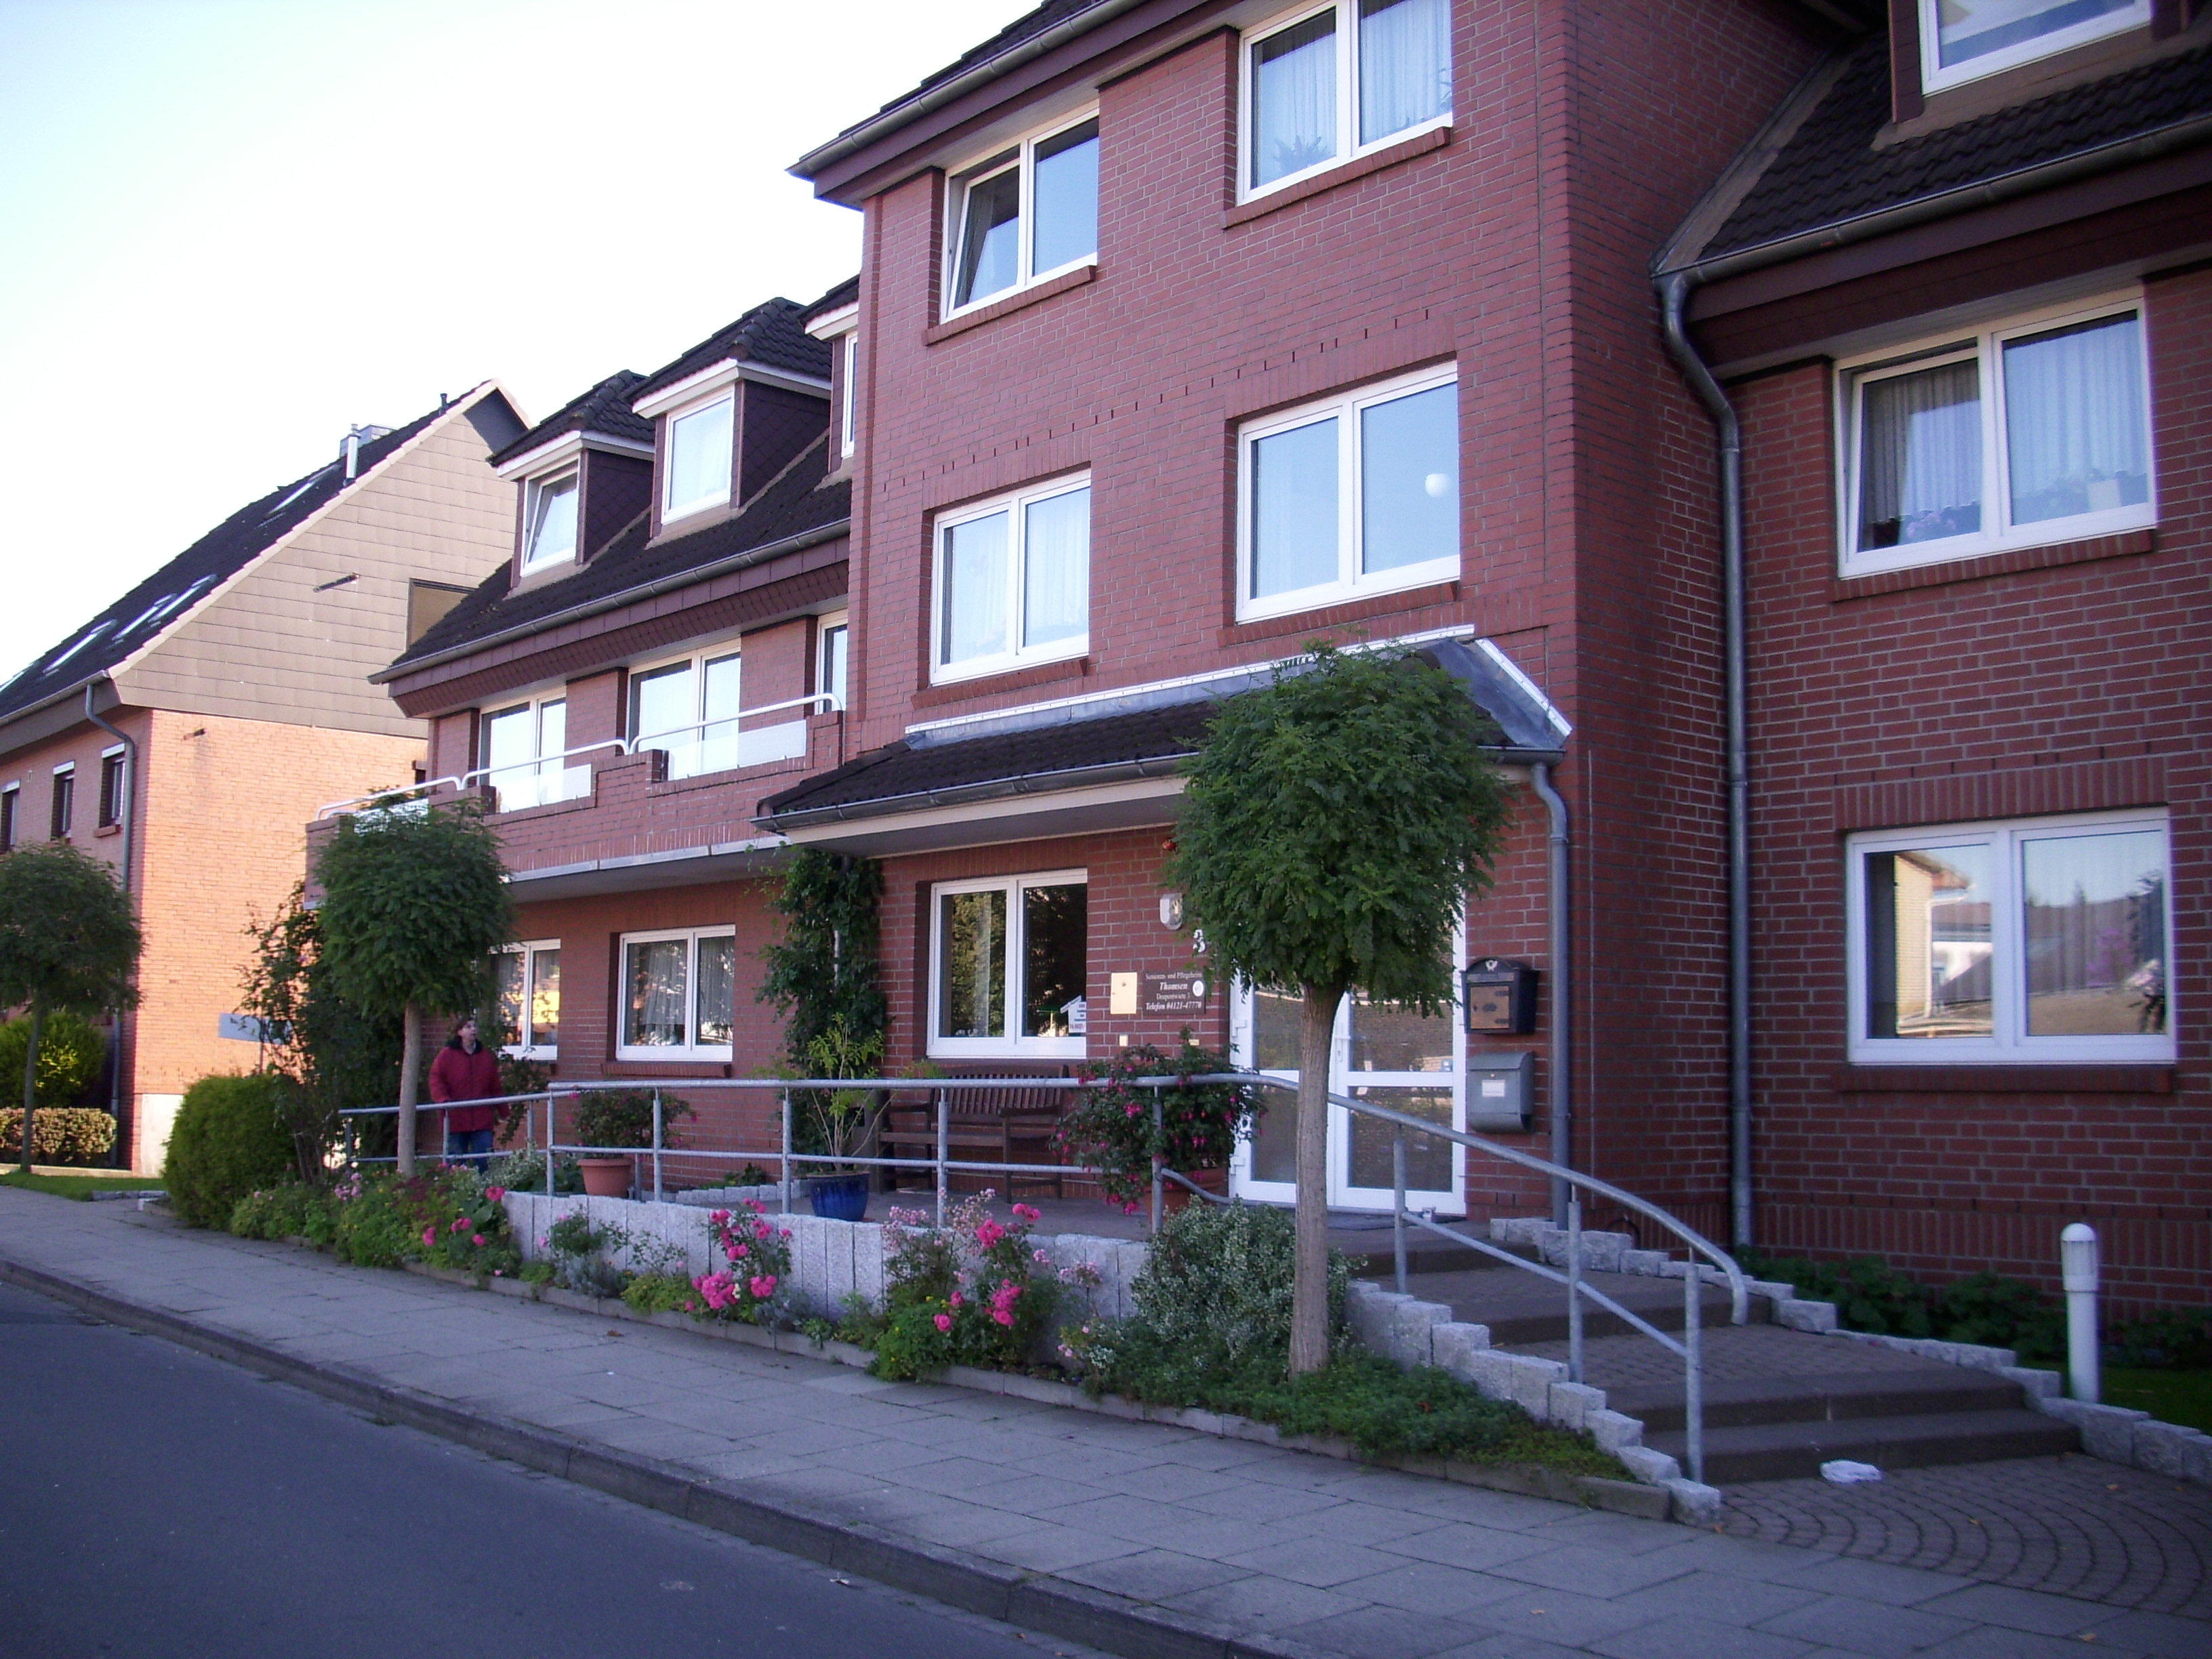 Seniorenhaus & Pflegeheim Thomsen